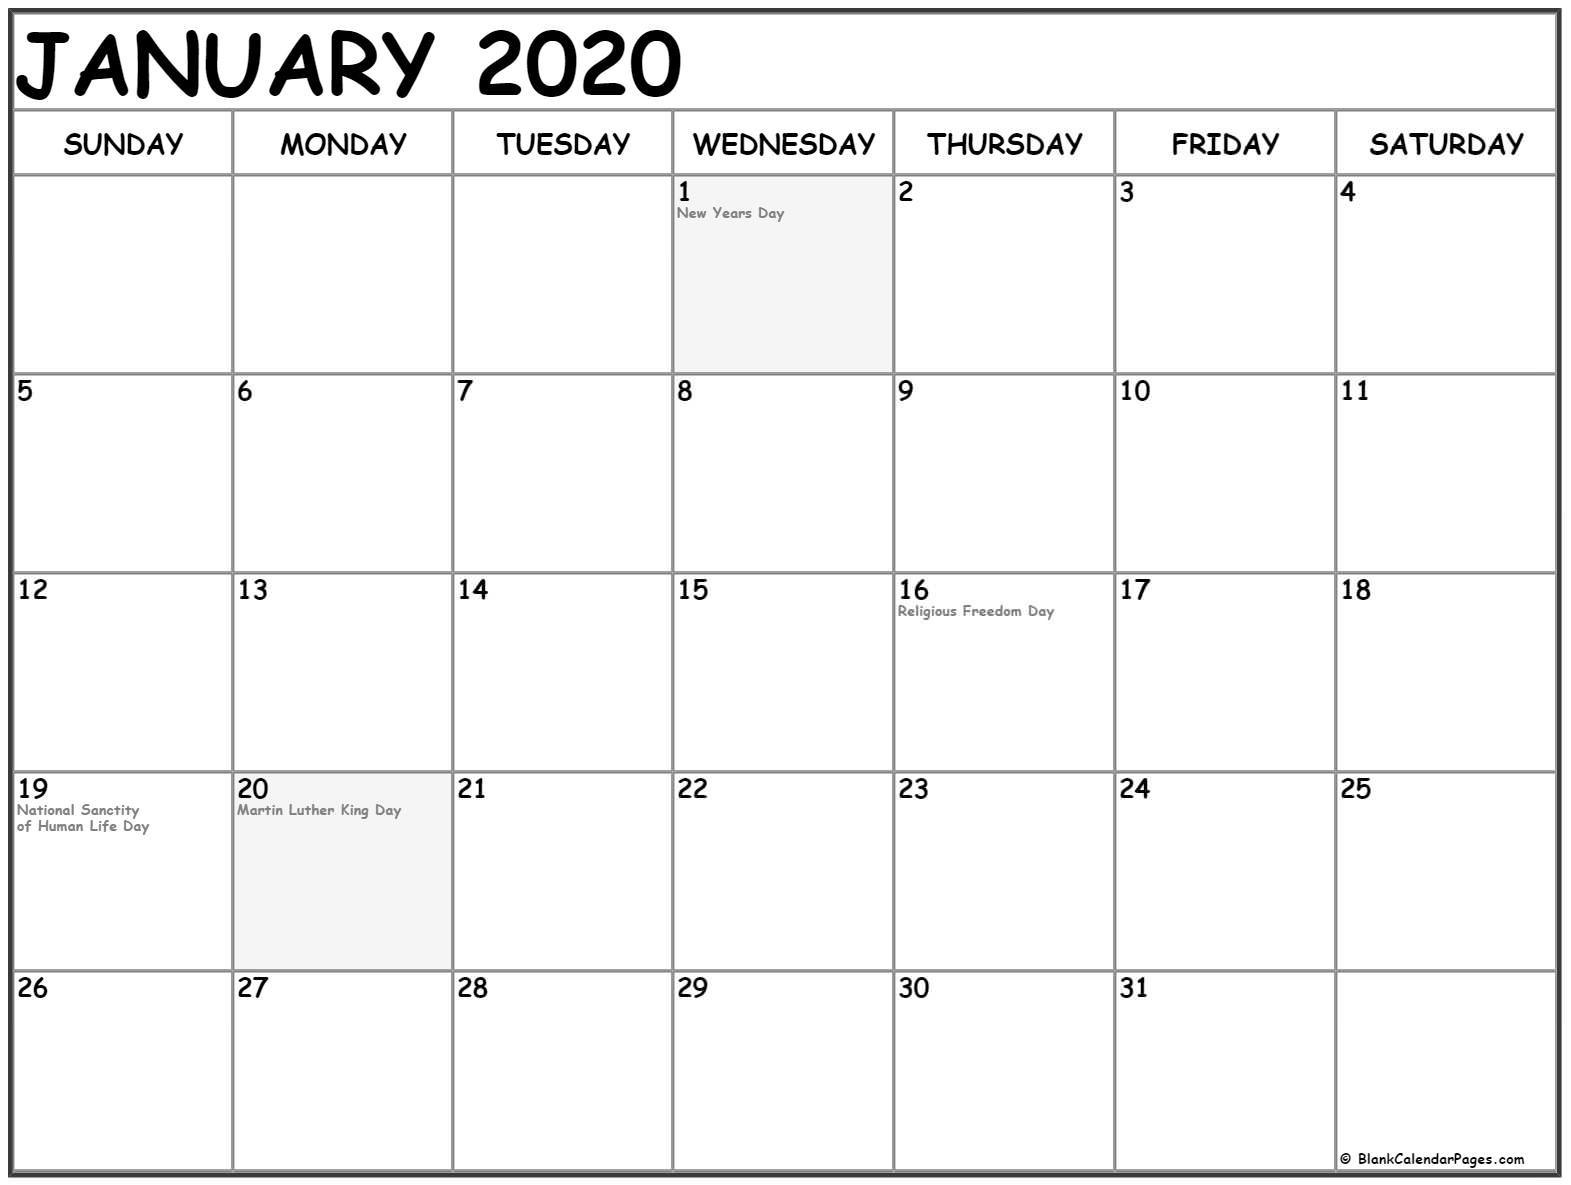 January 2020 Calendar Printable Templates Holidays - July-January 2020 Calendar Canada Printable